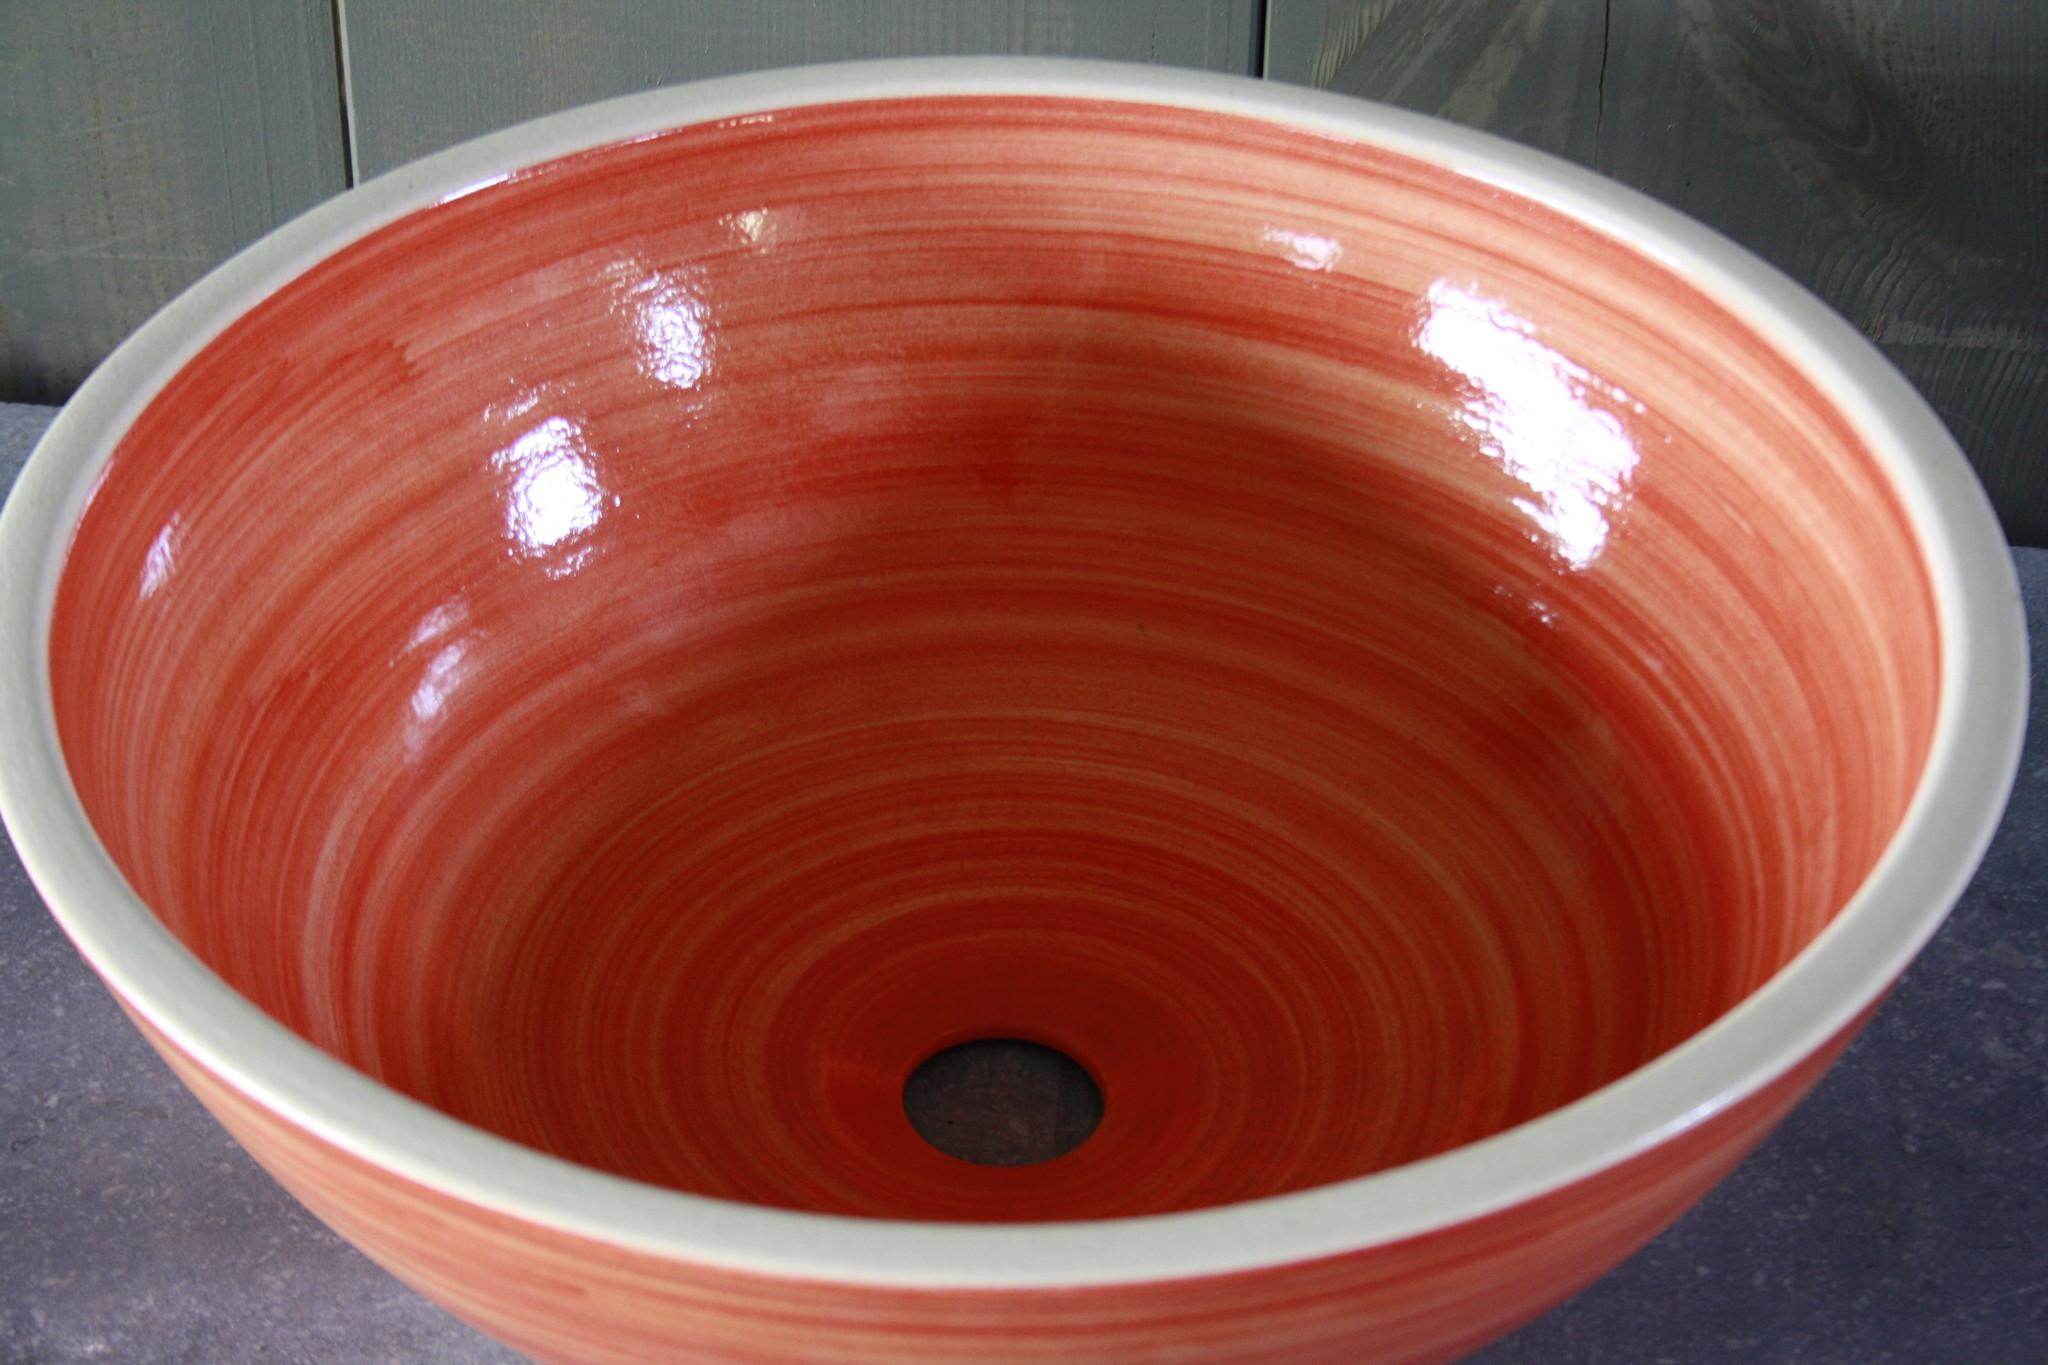 Borchia waskom porselein oranje 40 cm x 15 cm-5